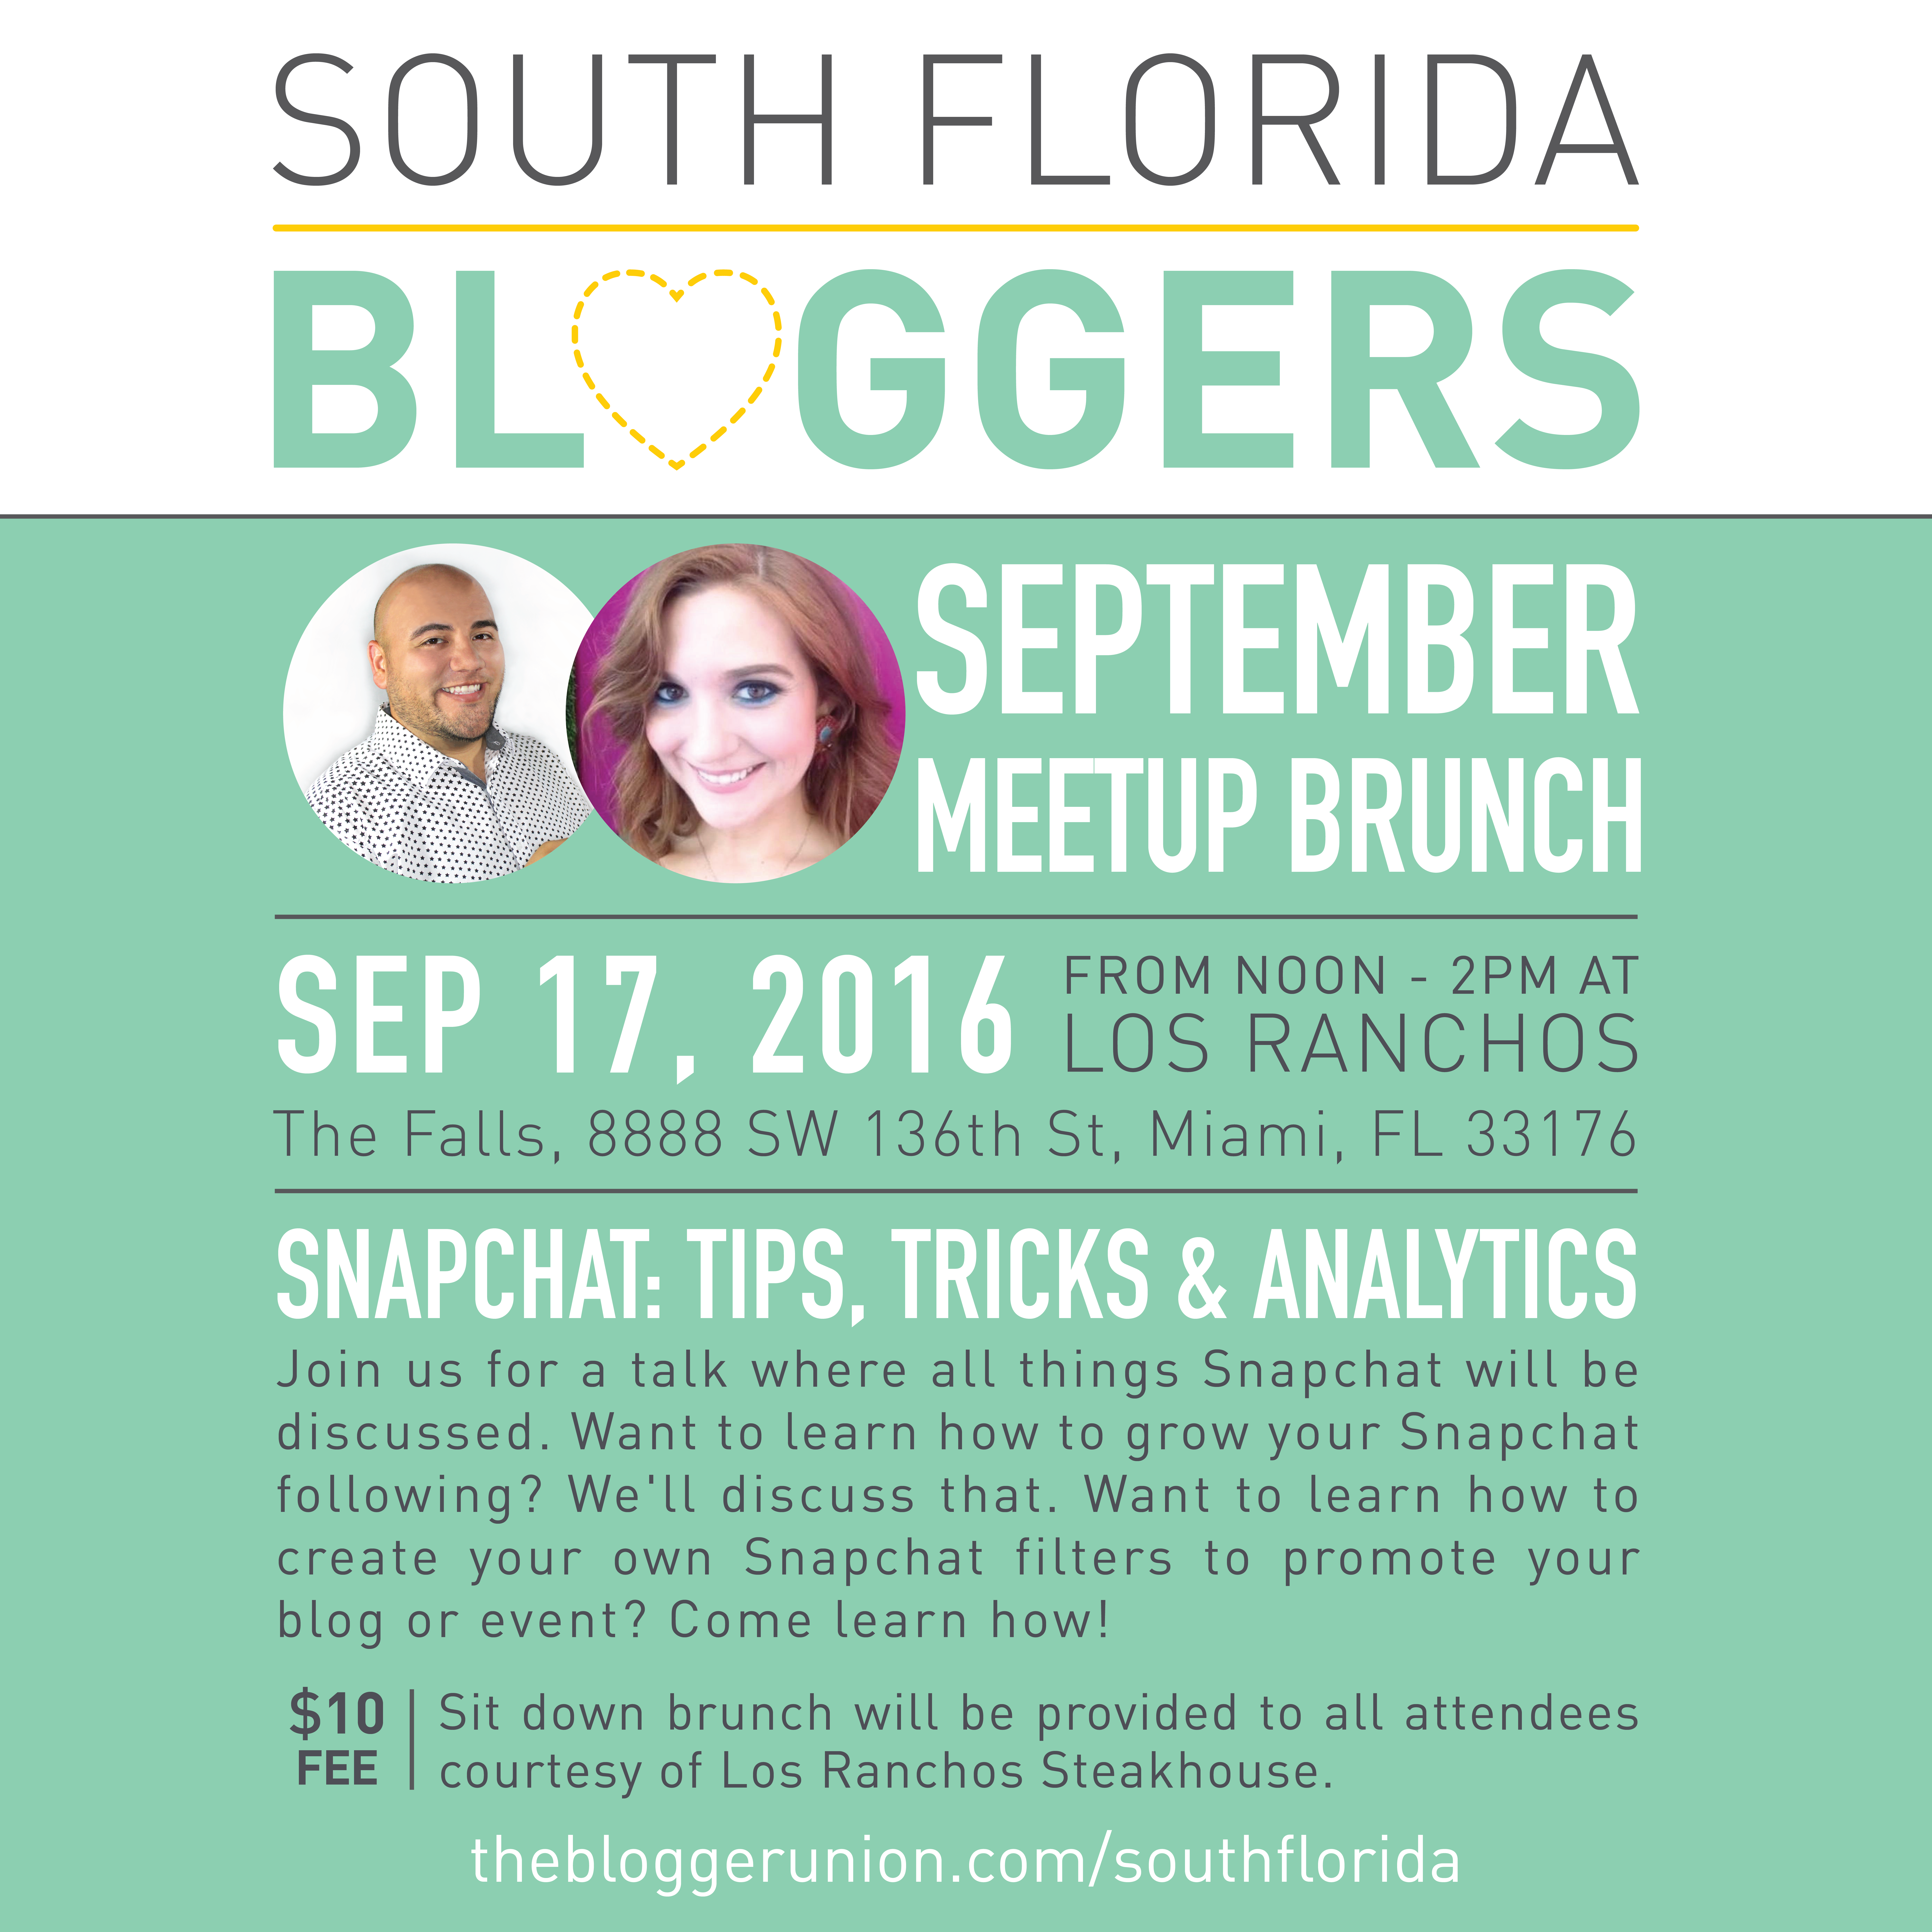 Sept-South-Florida-Bloggers-Meetup-Sept-South-Florida-Bloggers-Meetup-Los-Ranchos-The-Falls-Tips-Tricks-Snapchat